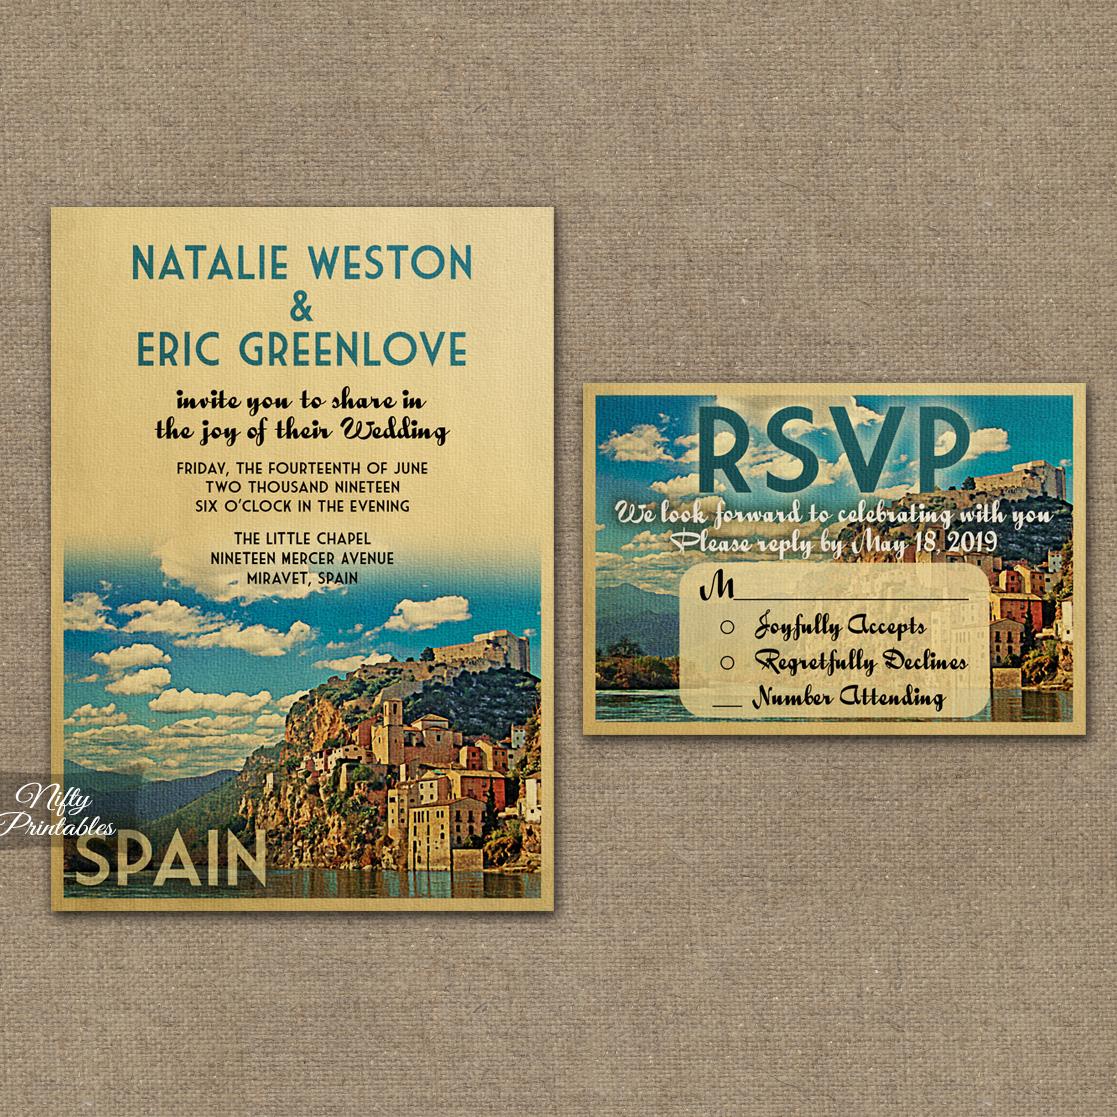 spain wedding invitations spanish wedding invitations Spain Wedding Invitations VTW